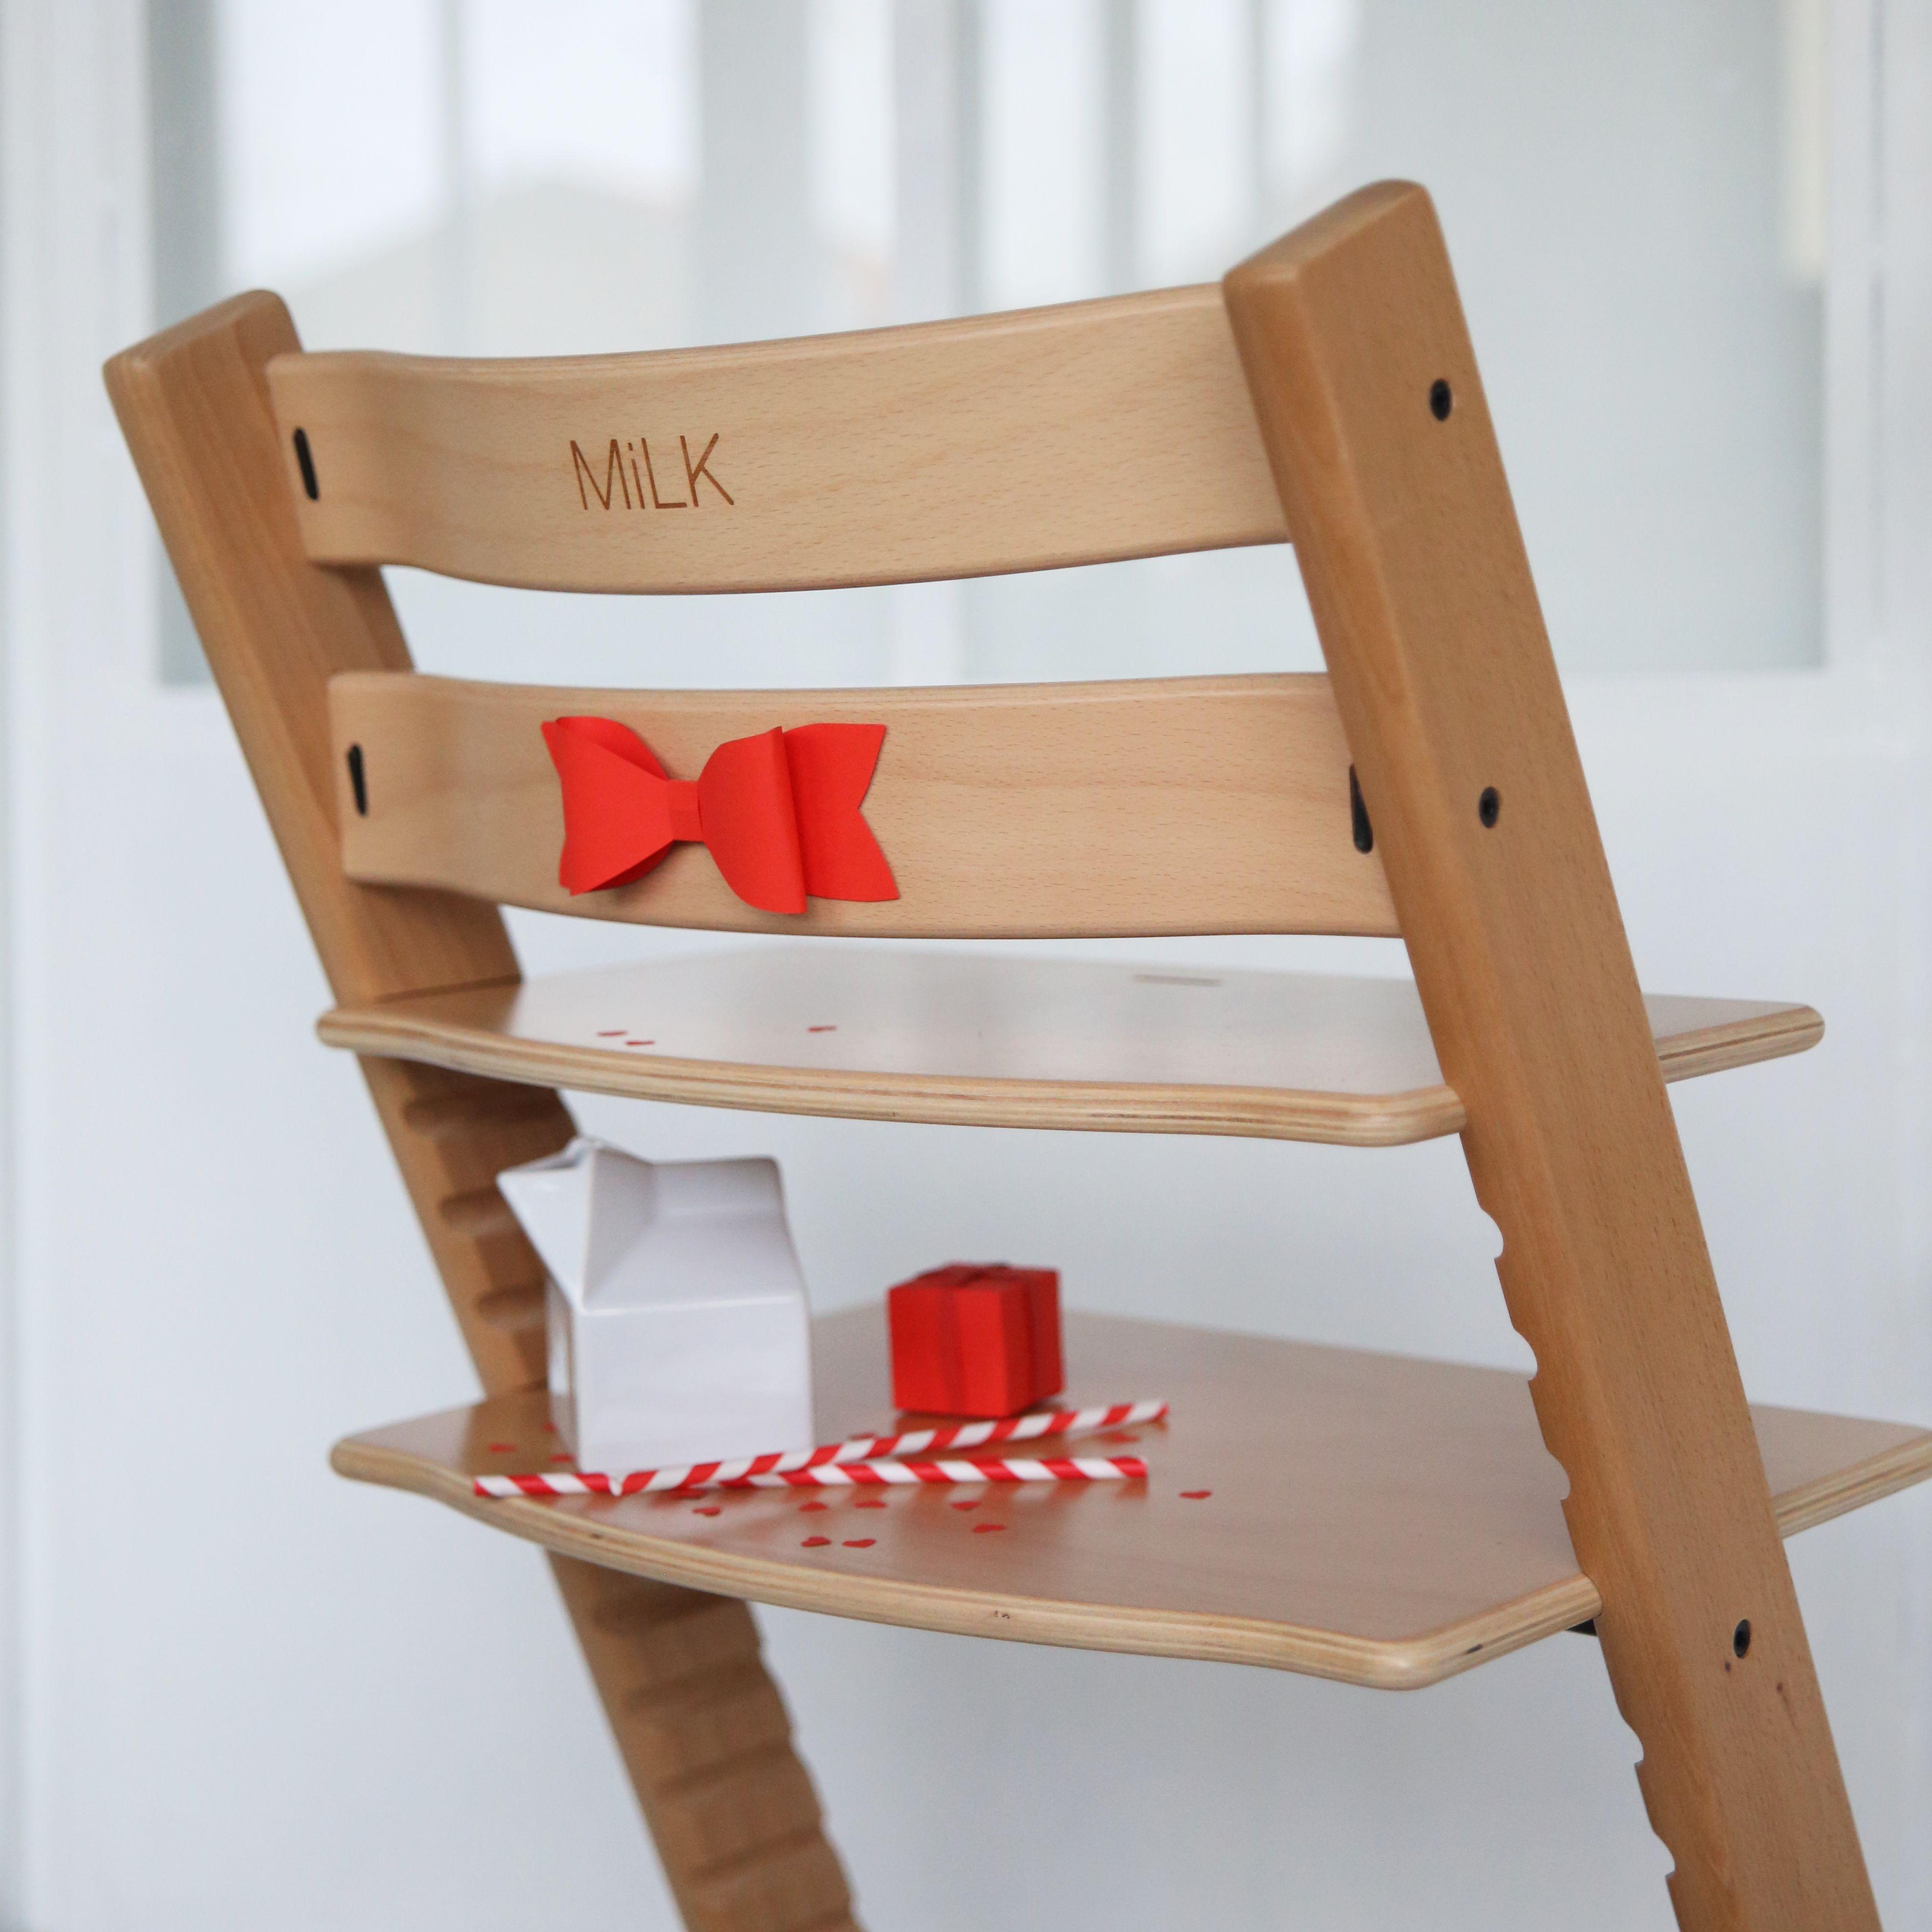 Chaise Tripp Trapp de Stokke personnalisée MilK. Photo (c) Jesus Sauvage pour : chaise stokke tripp trapp - Sectionals, Sofas & Couches